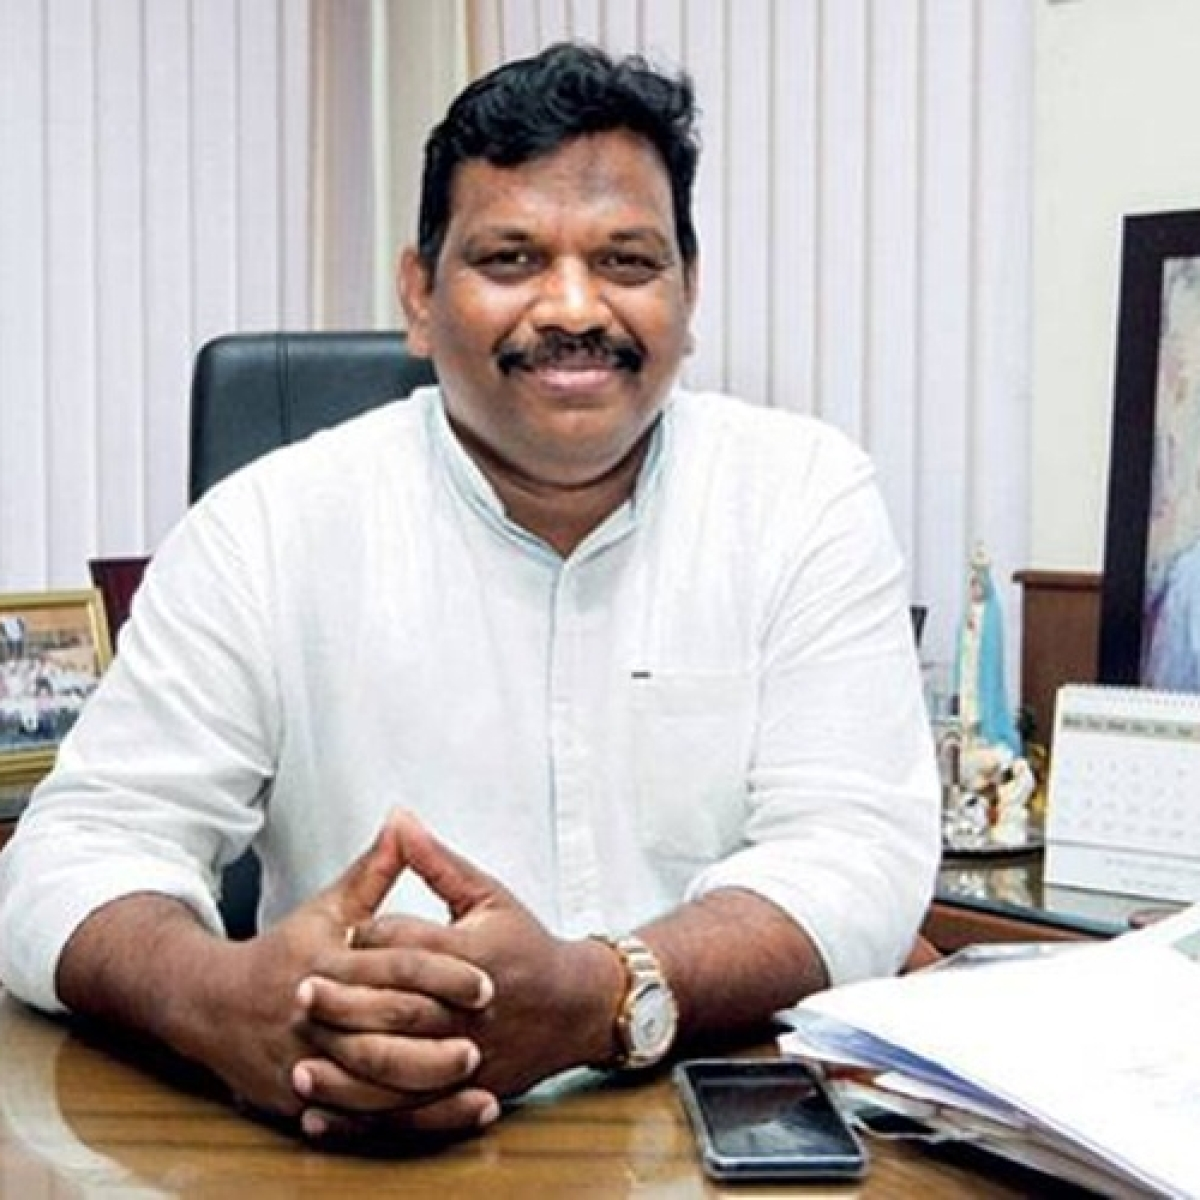 Goa minister Michael Lobo wants 15-day ban on travellers from Maharashtra